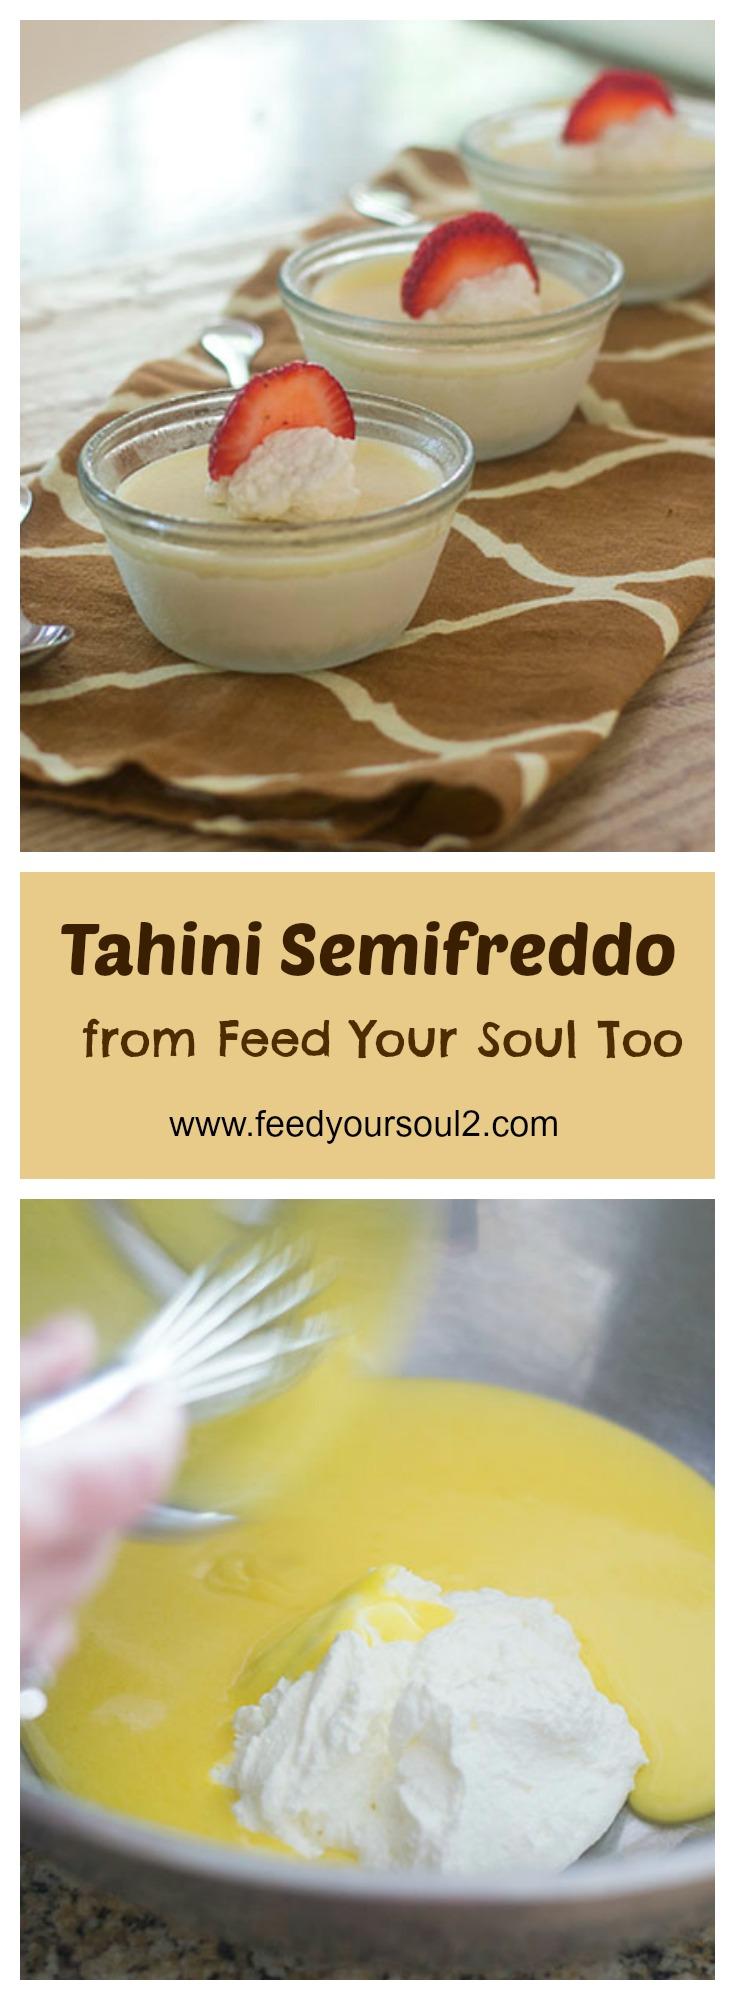 Tahini Semifreddo #tahini #ldessert #middleeasternfood | feedyoursoul2.com